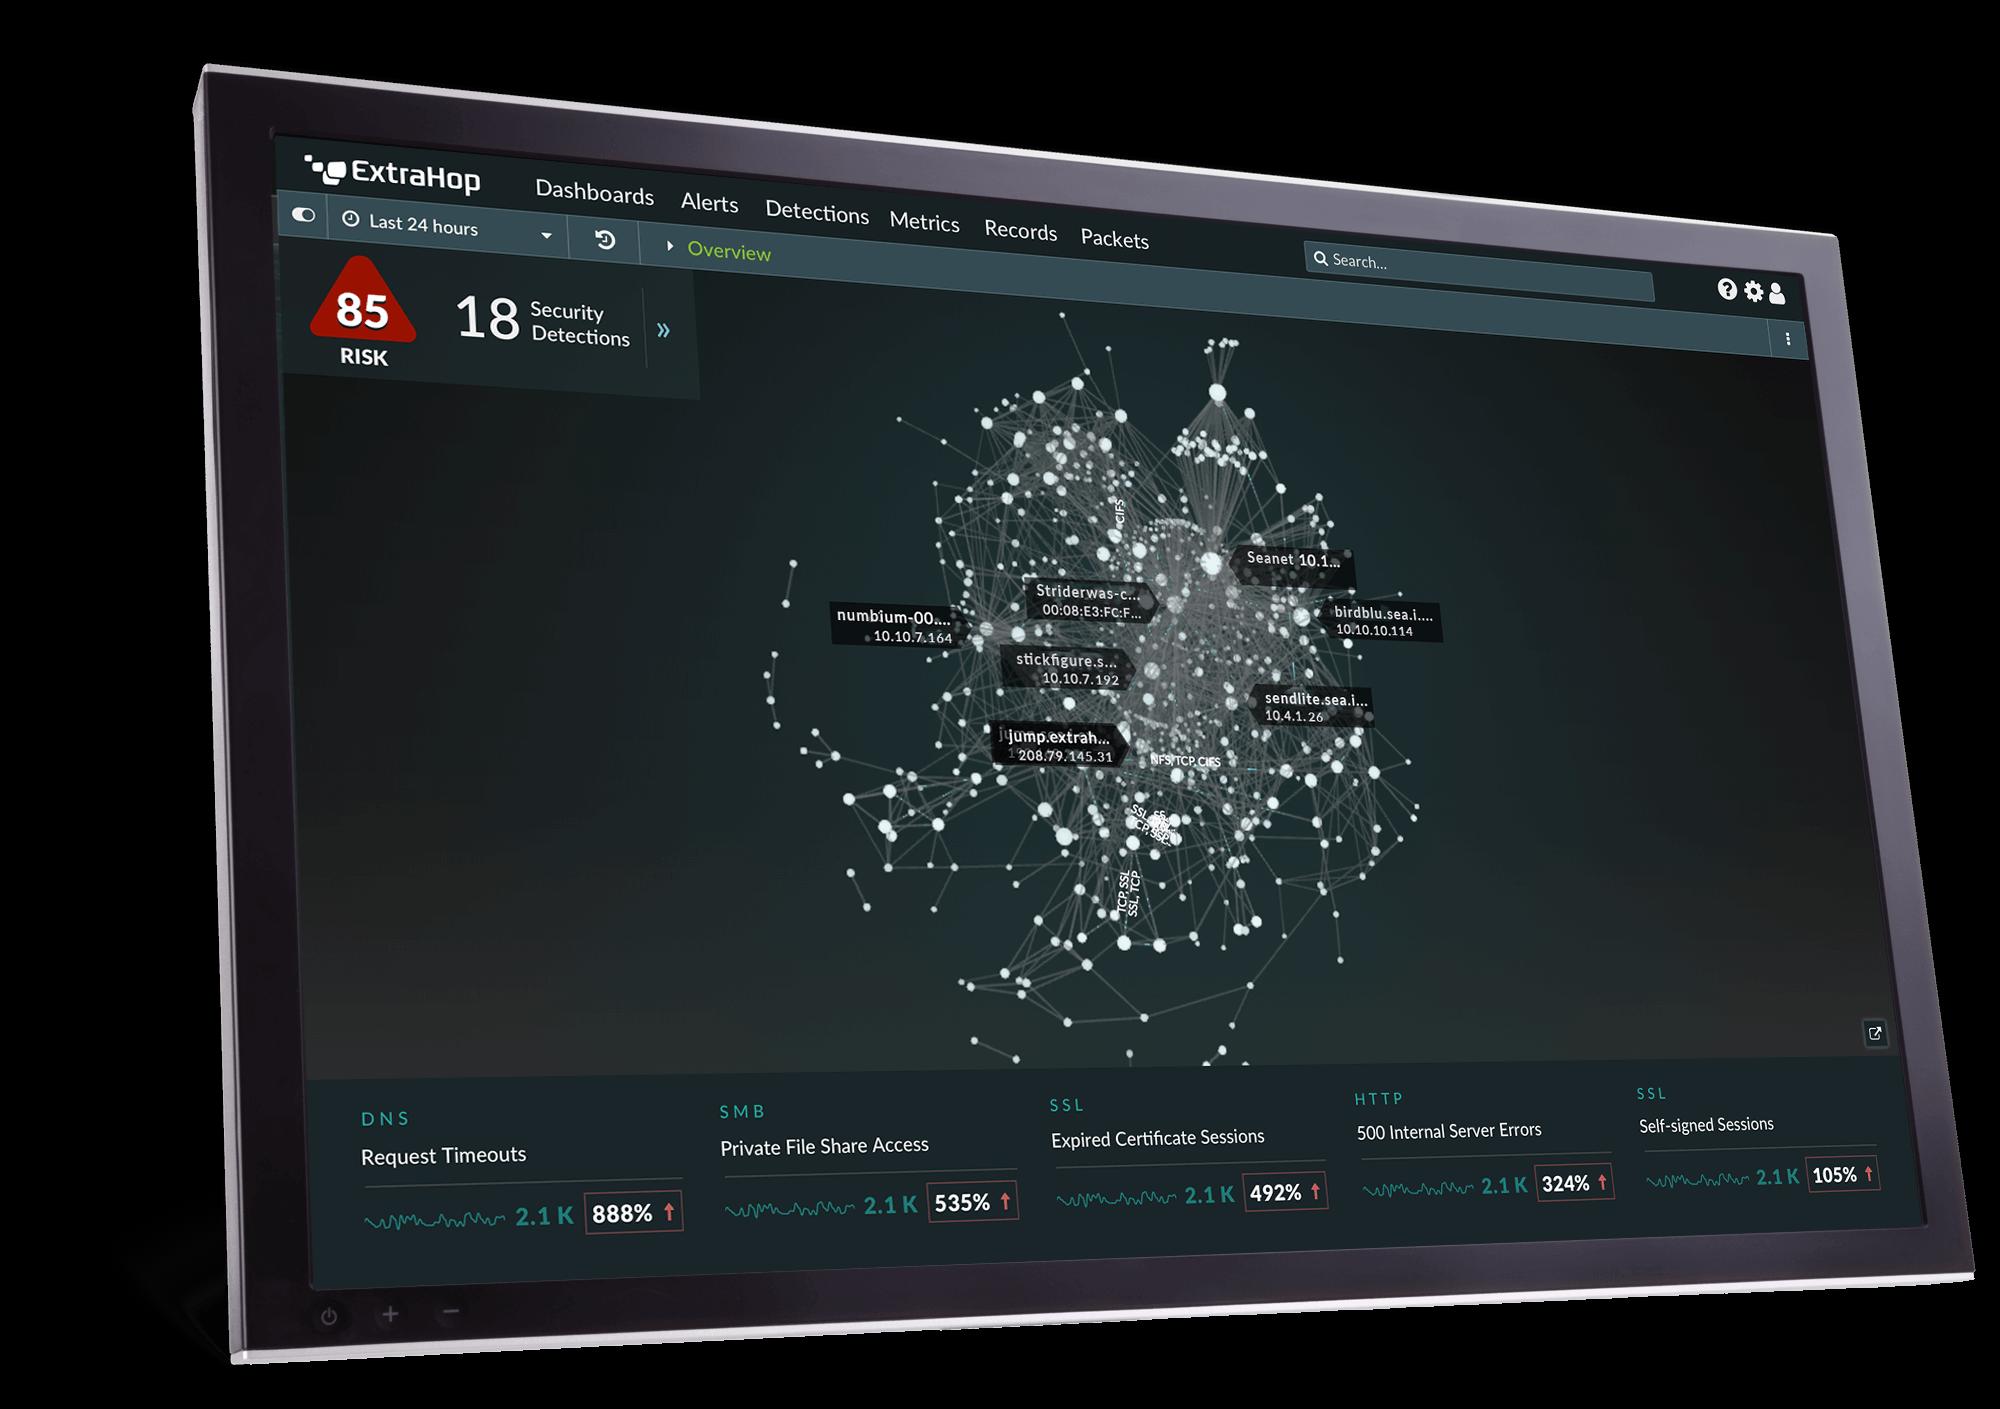 ExtraHop UI